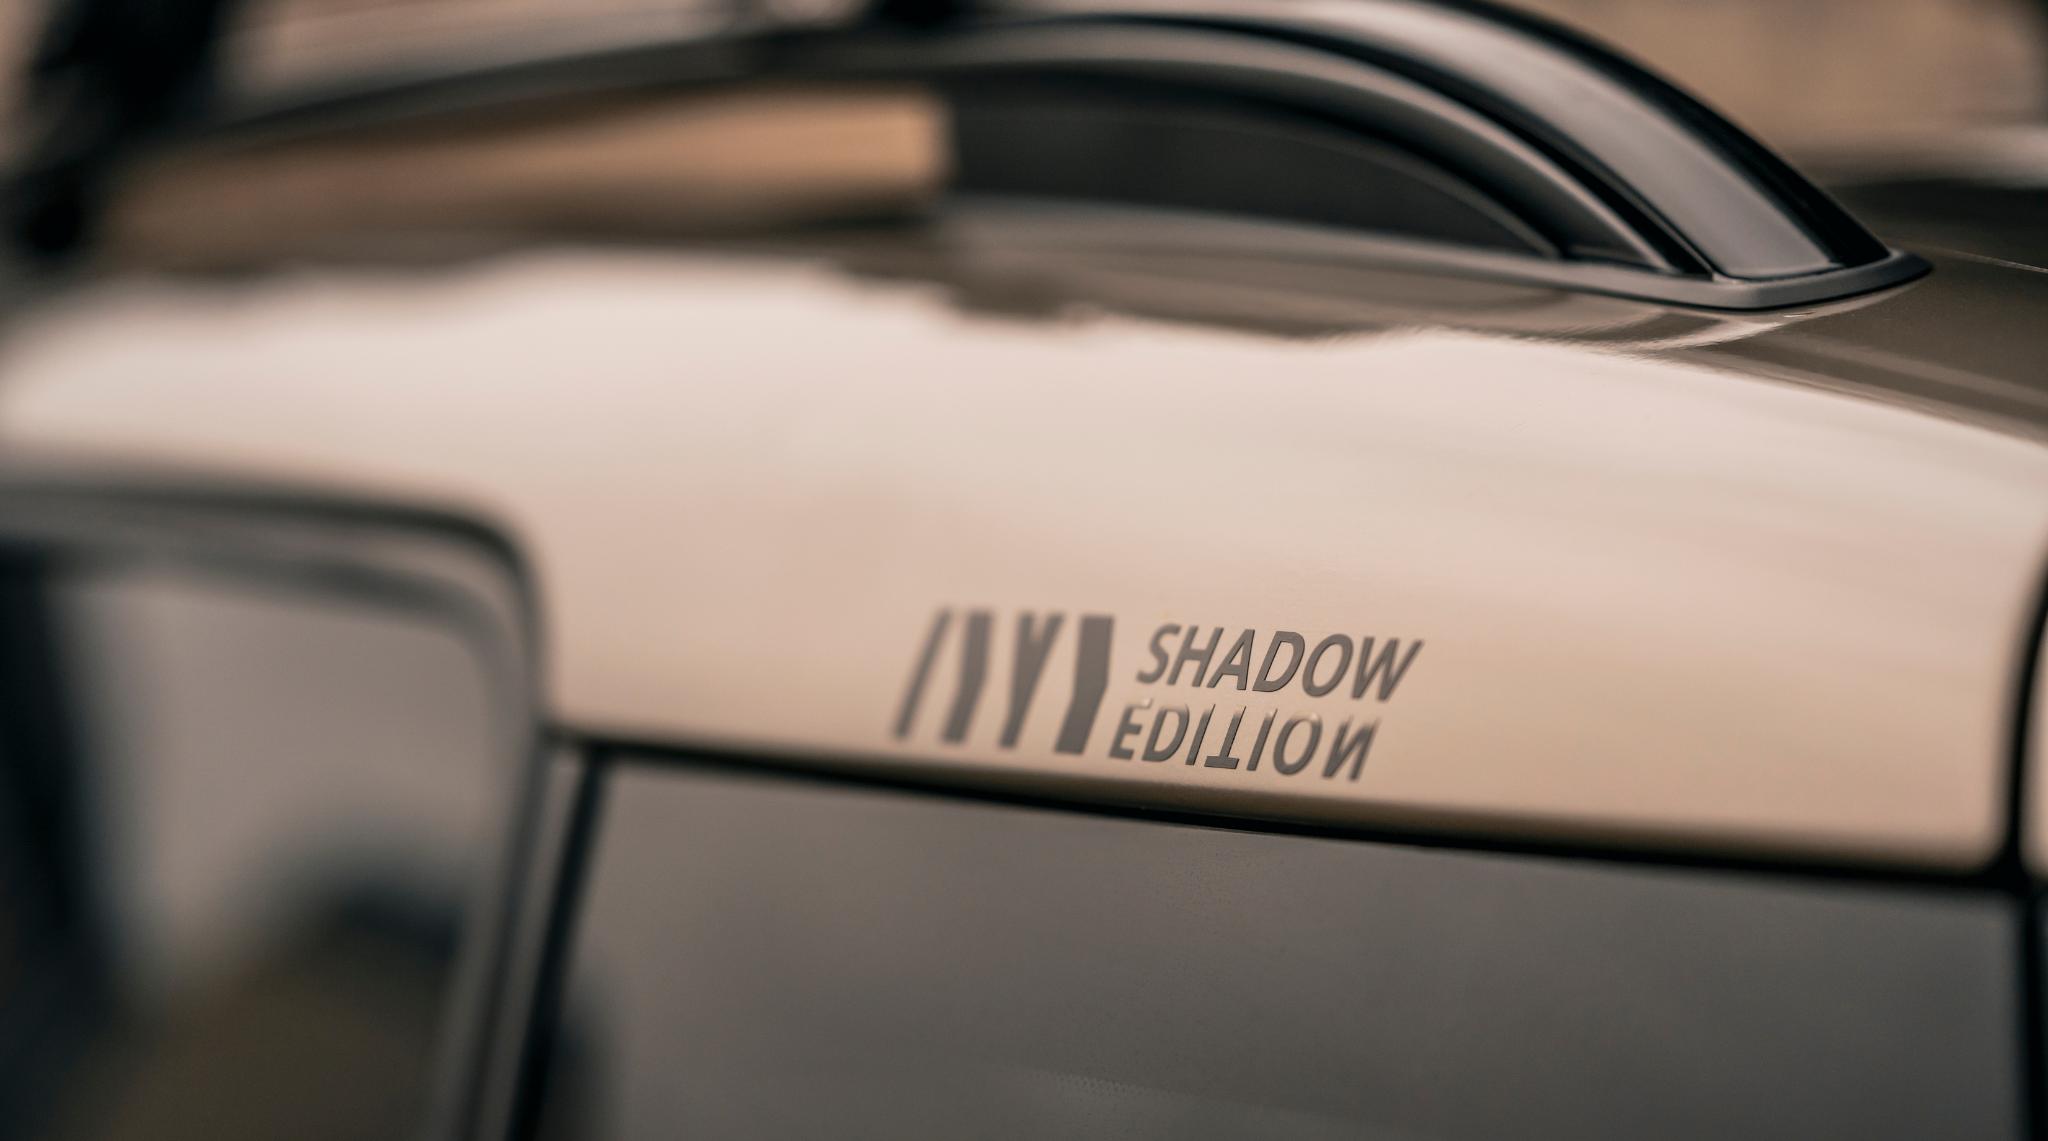 MINI Shadow Edition Roof Rail